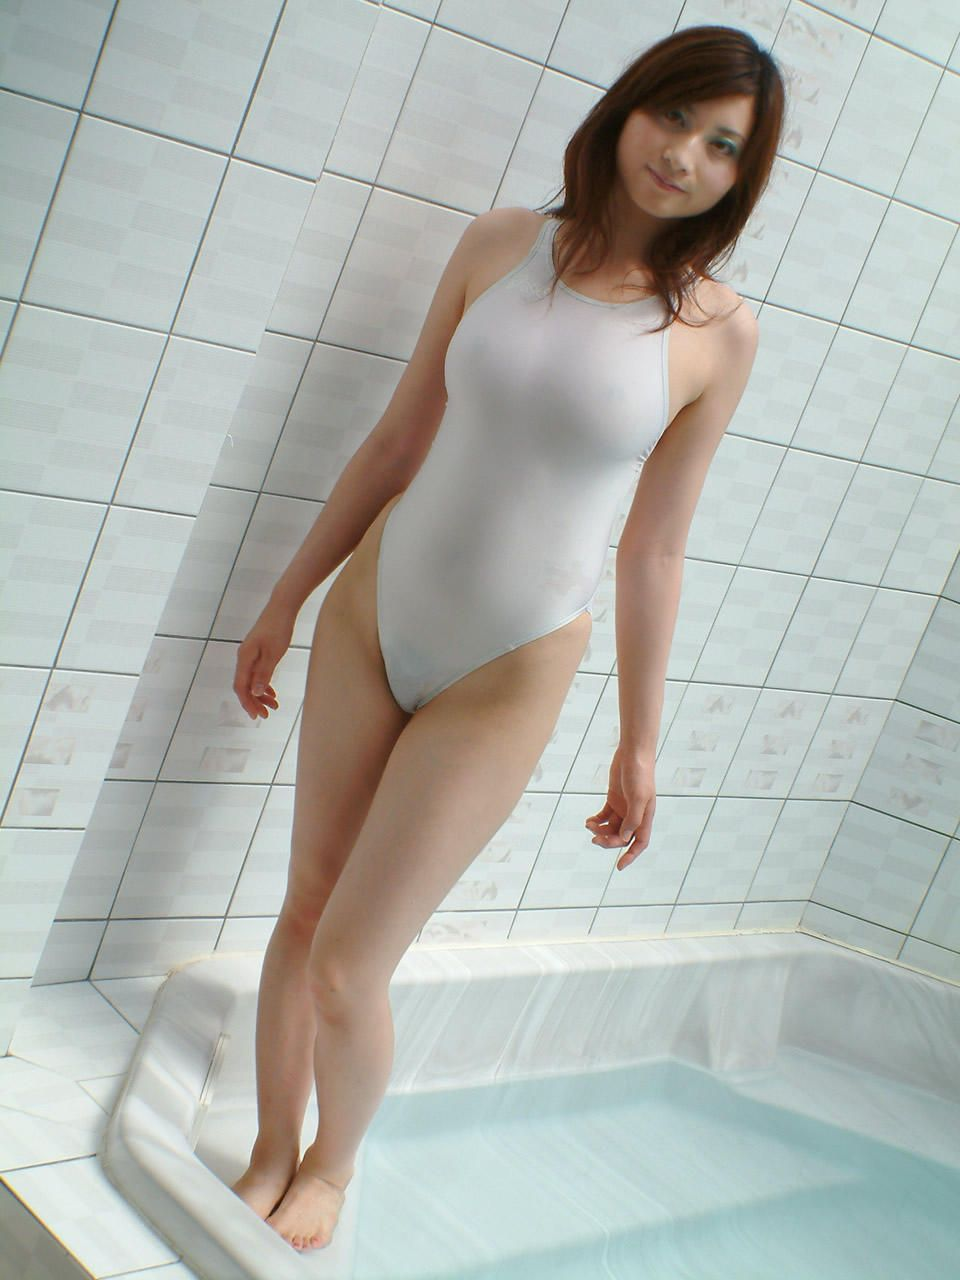 nude busty women banging